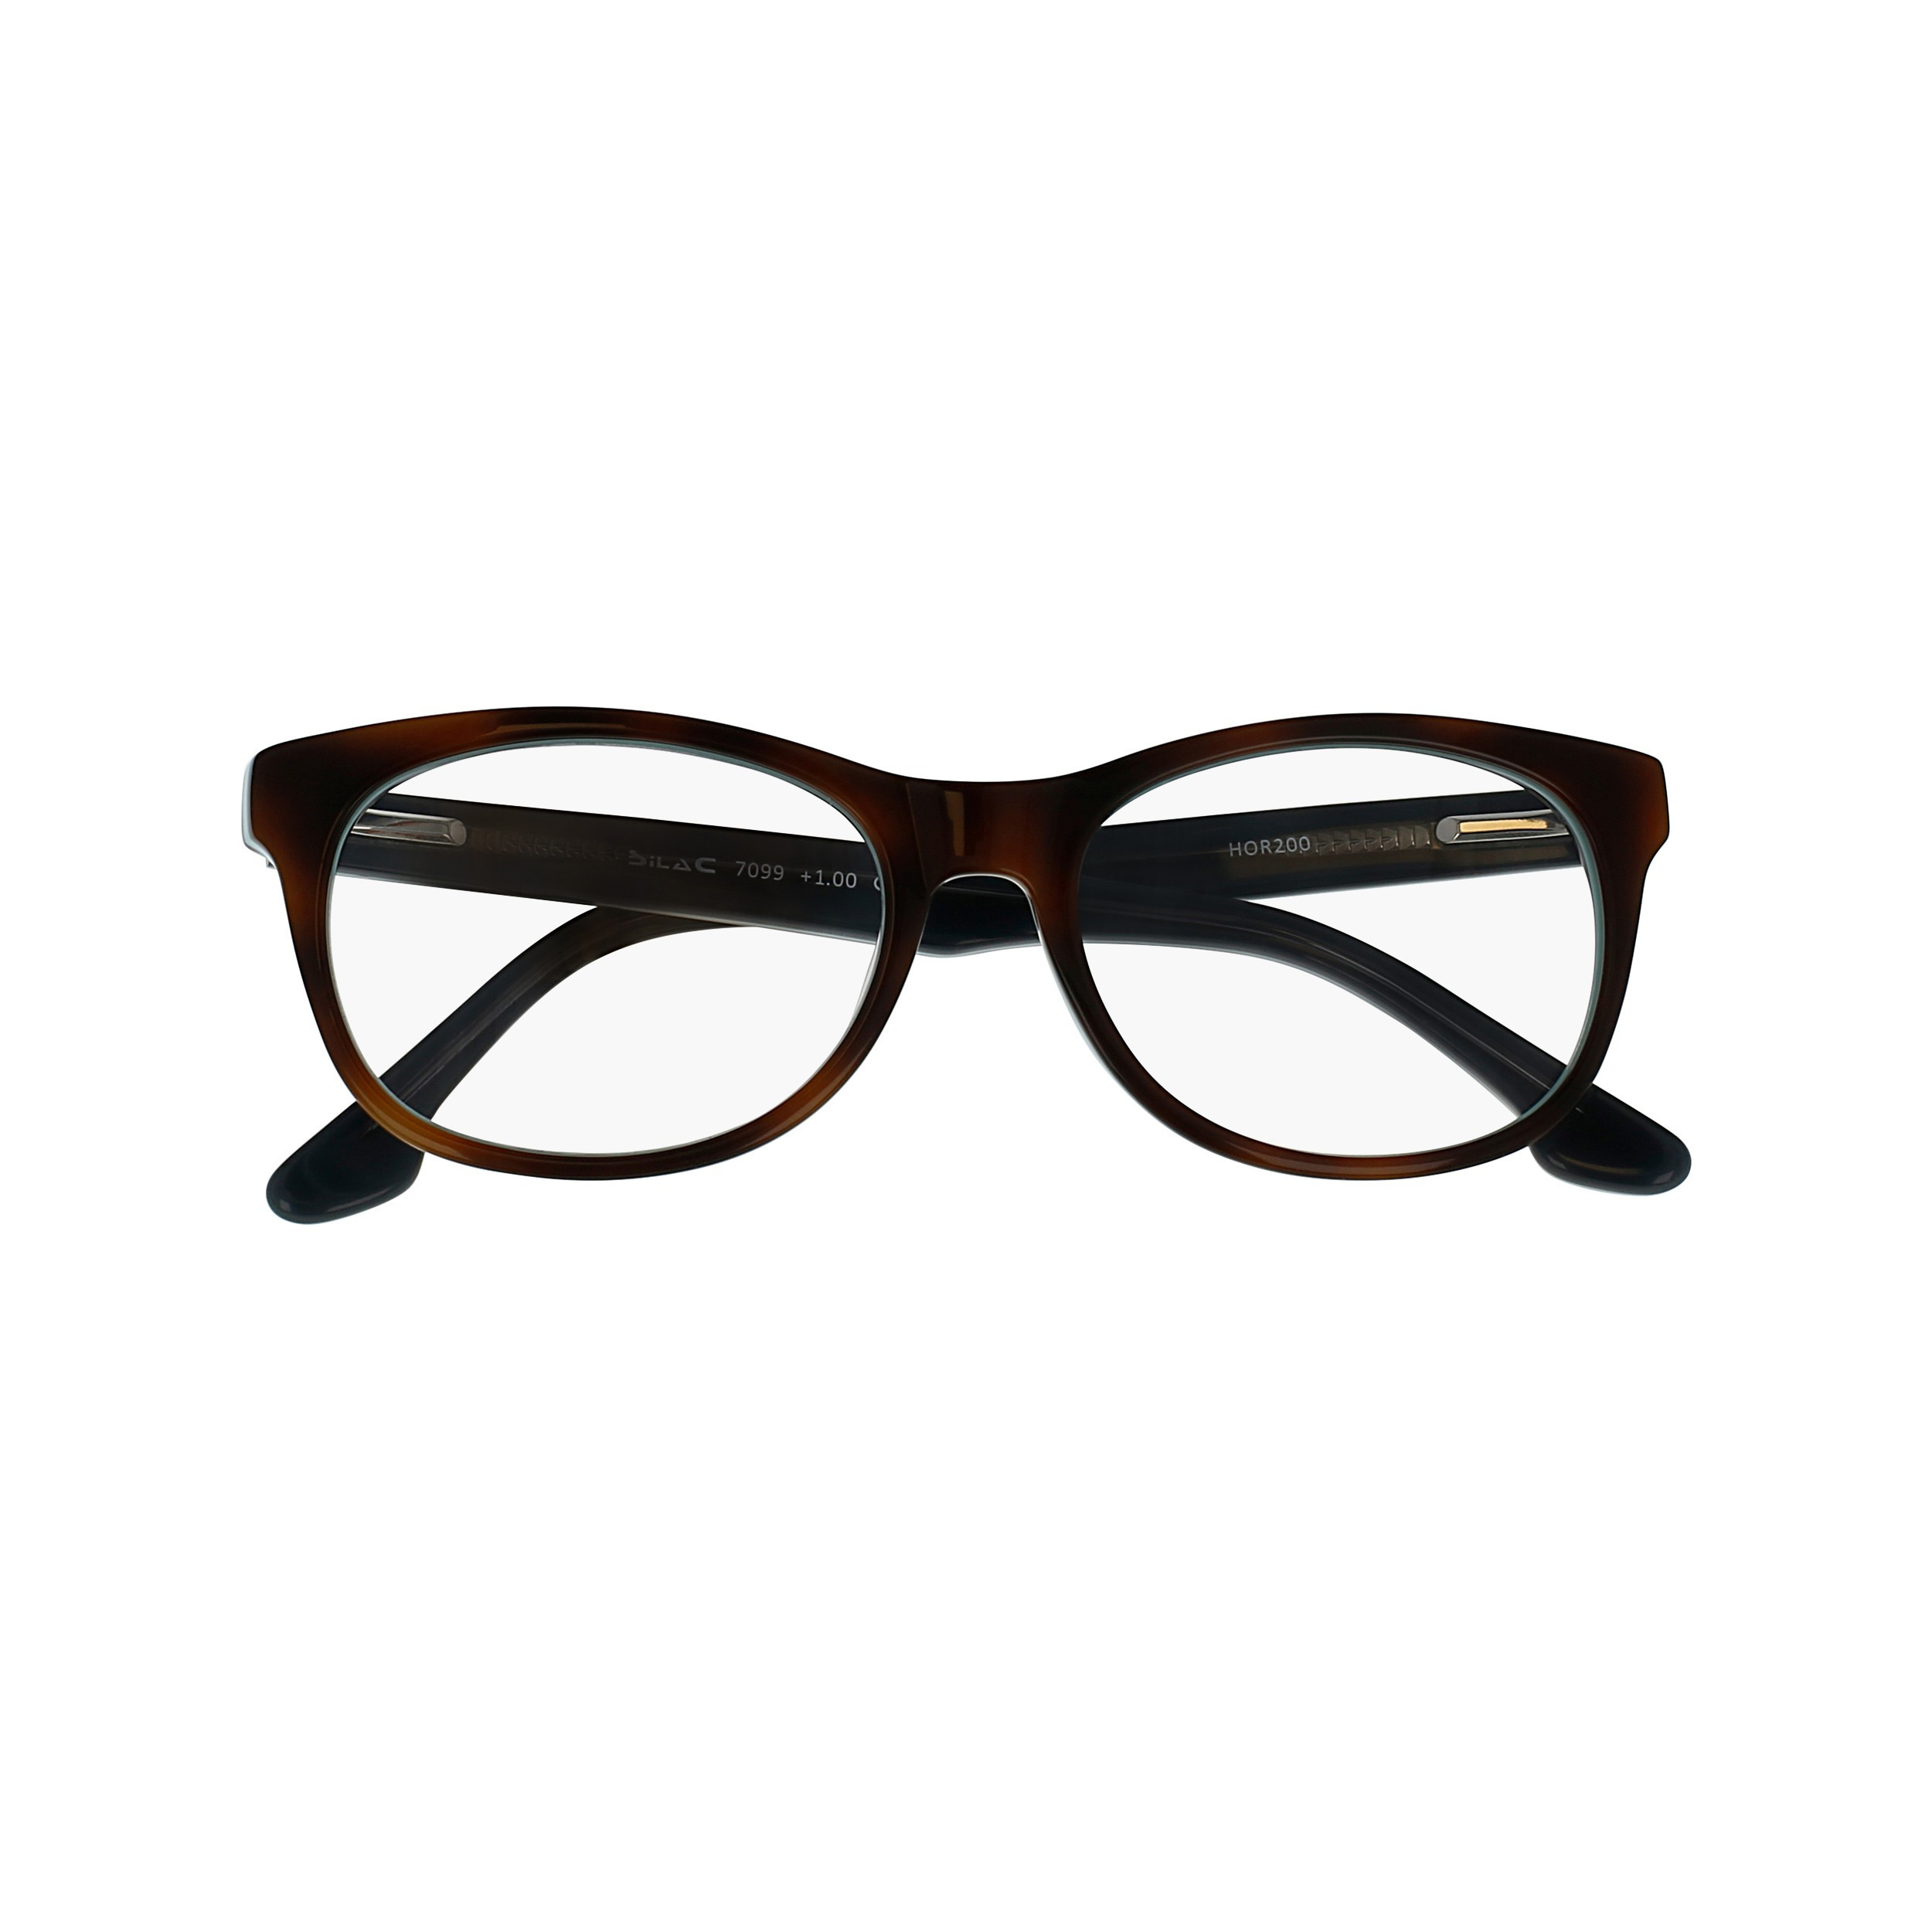 c77a397925 BLUE ACETATE - Gafas de Lectura Mujer